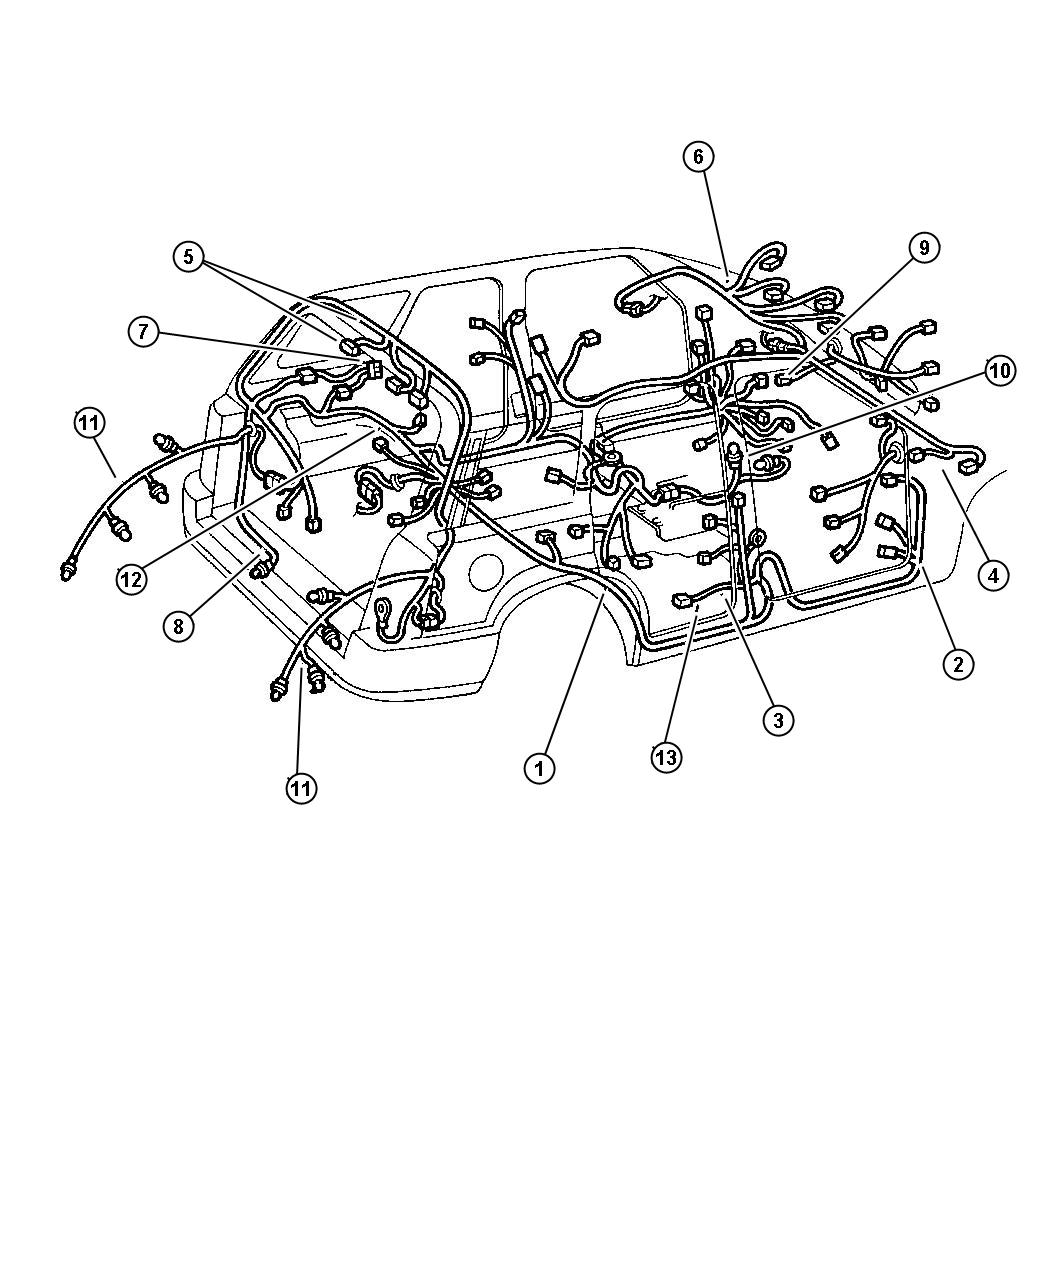 Dodge Dakota Wiring Tail Lamp With Sockets Rear Body Door